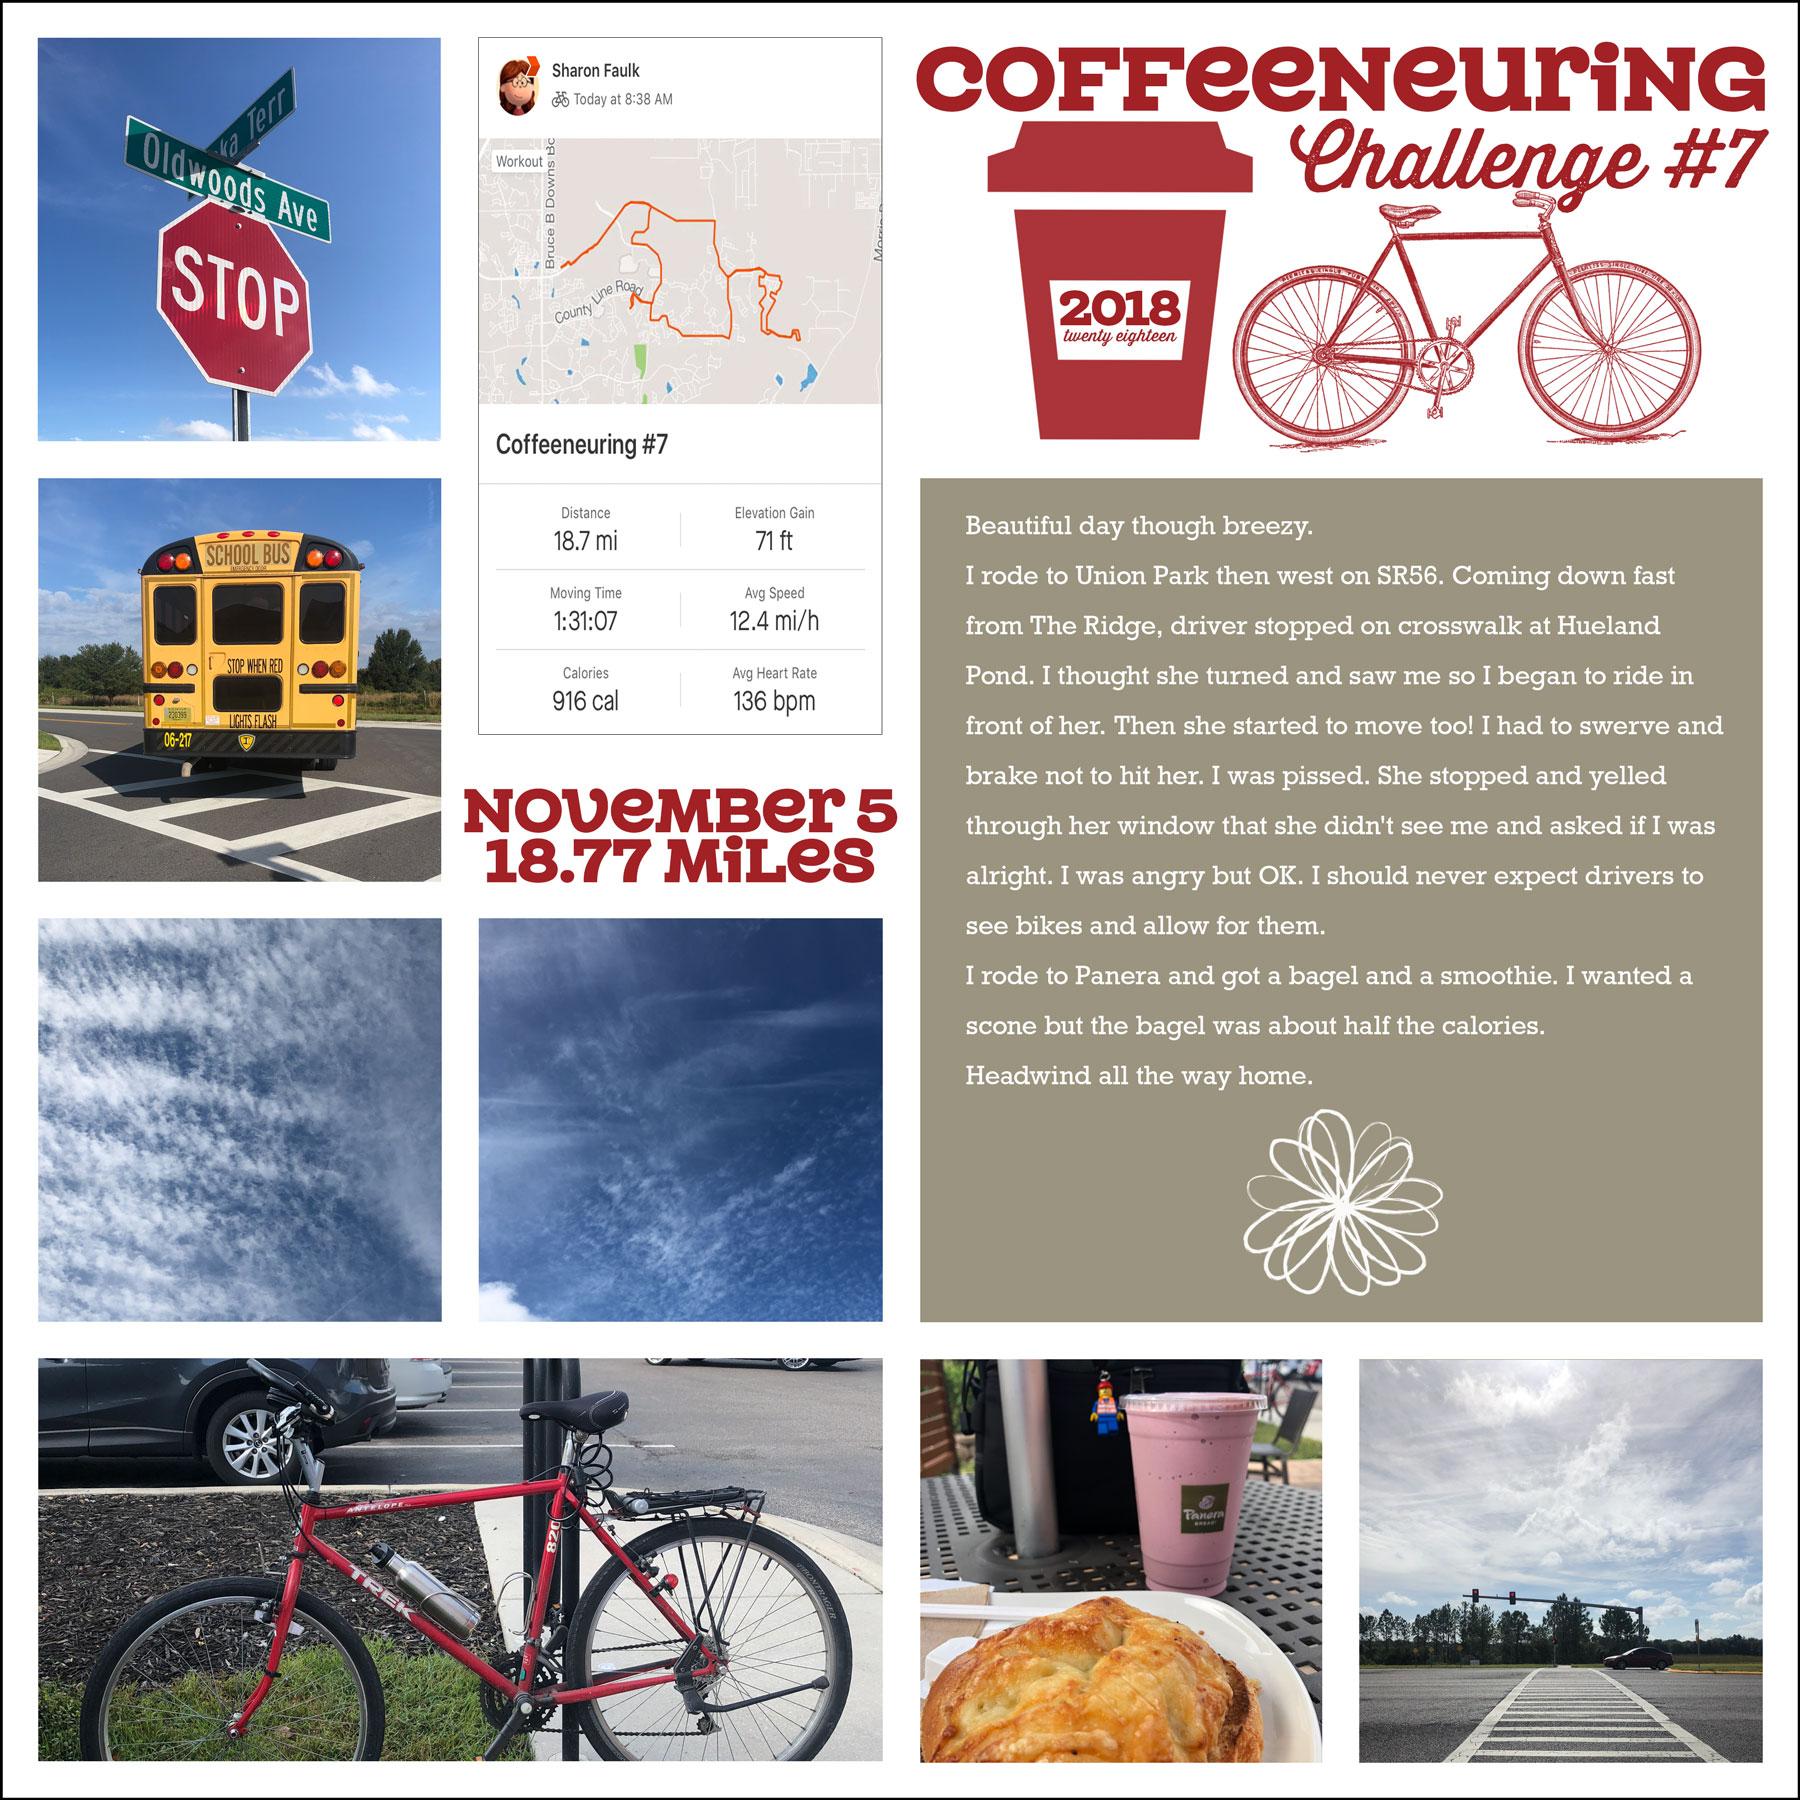 20181105-coffeeneuring.jpg